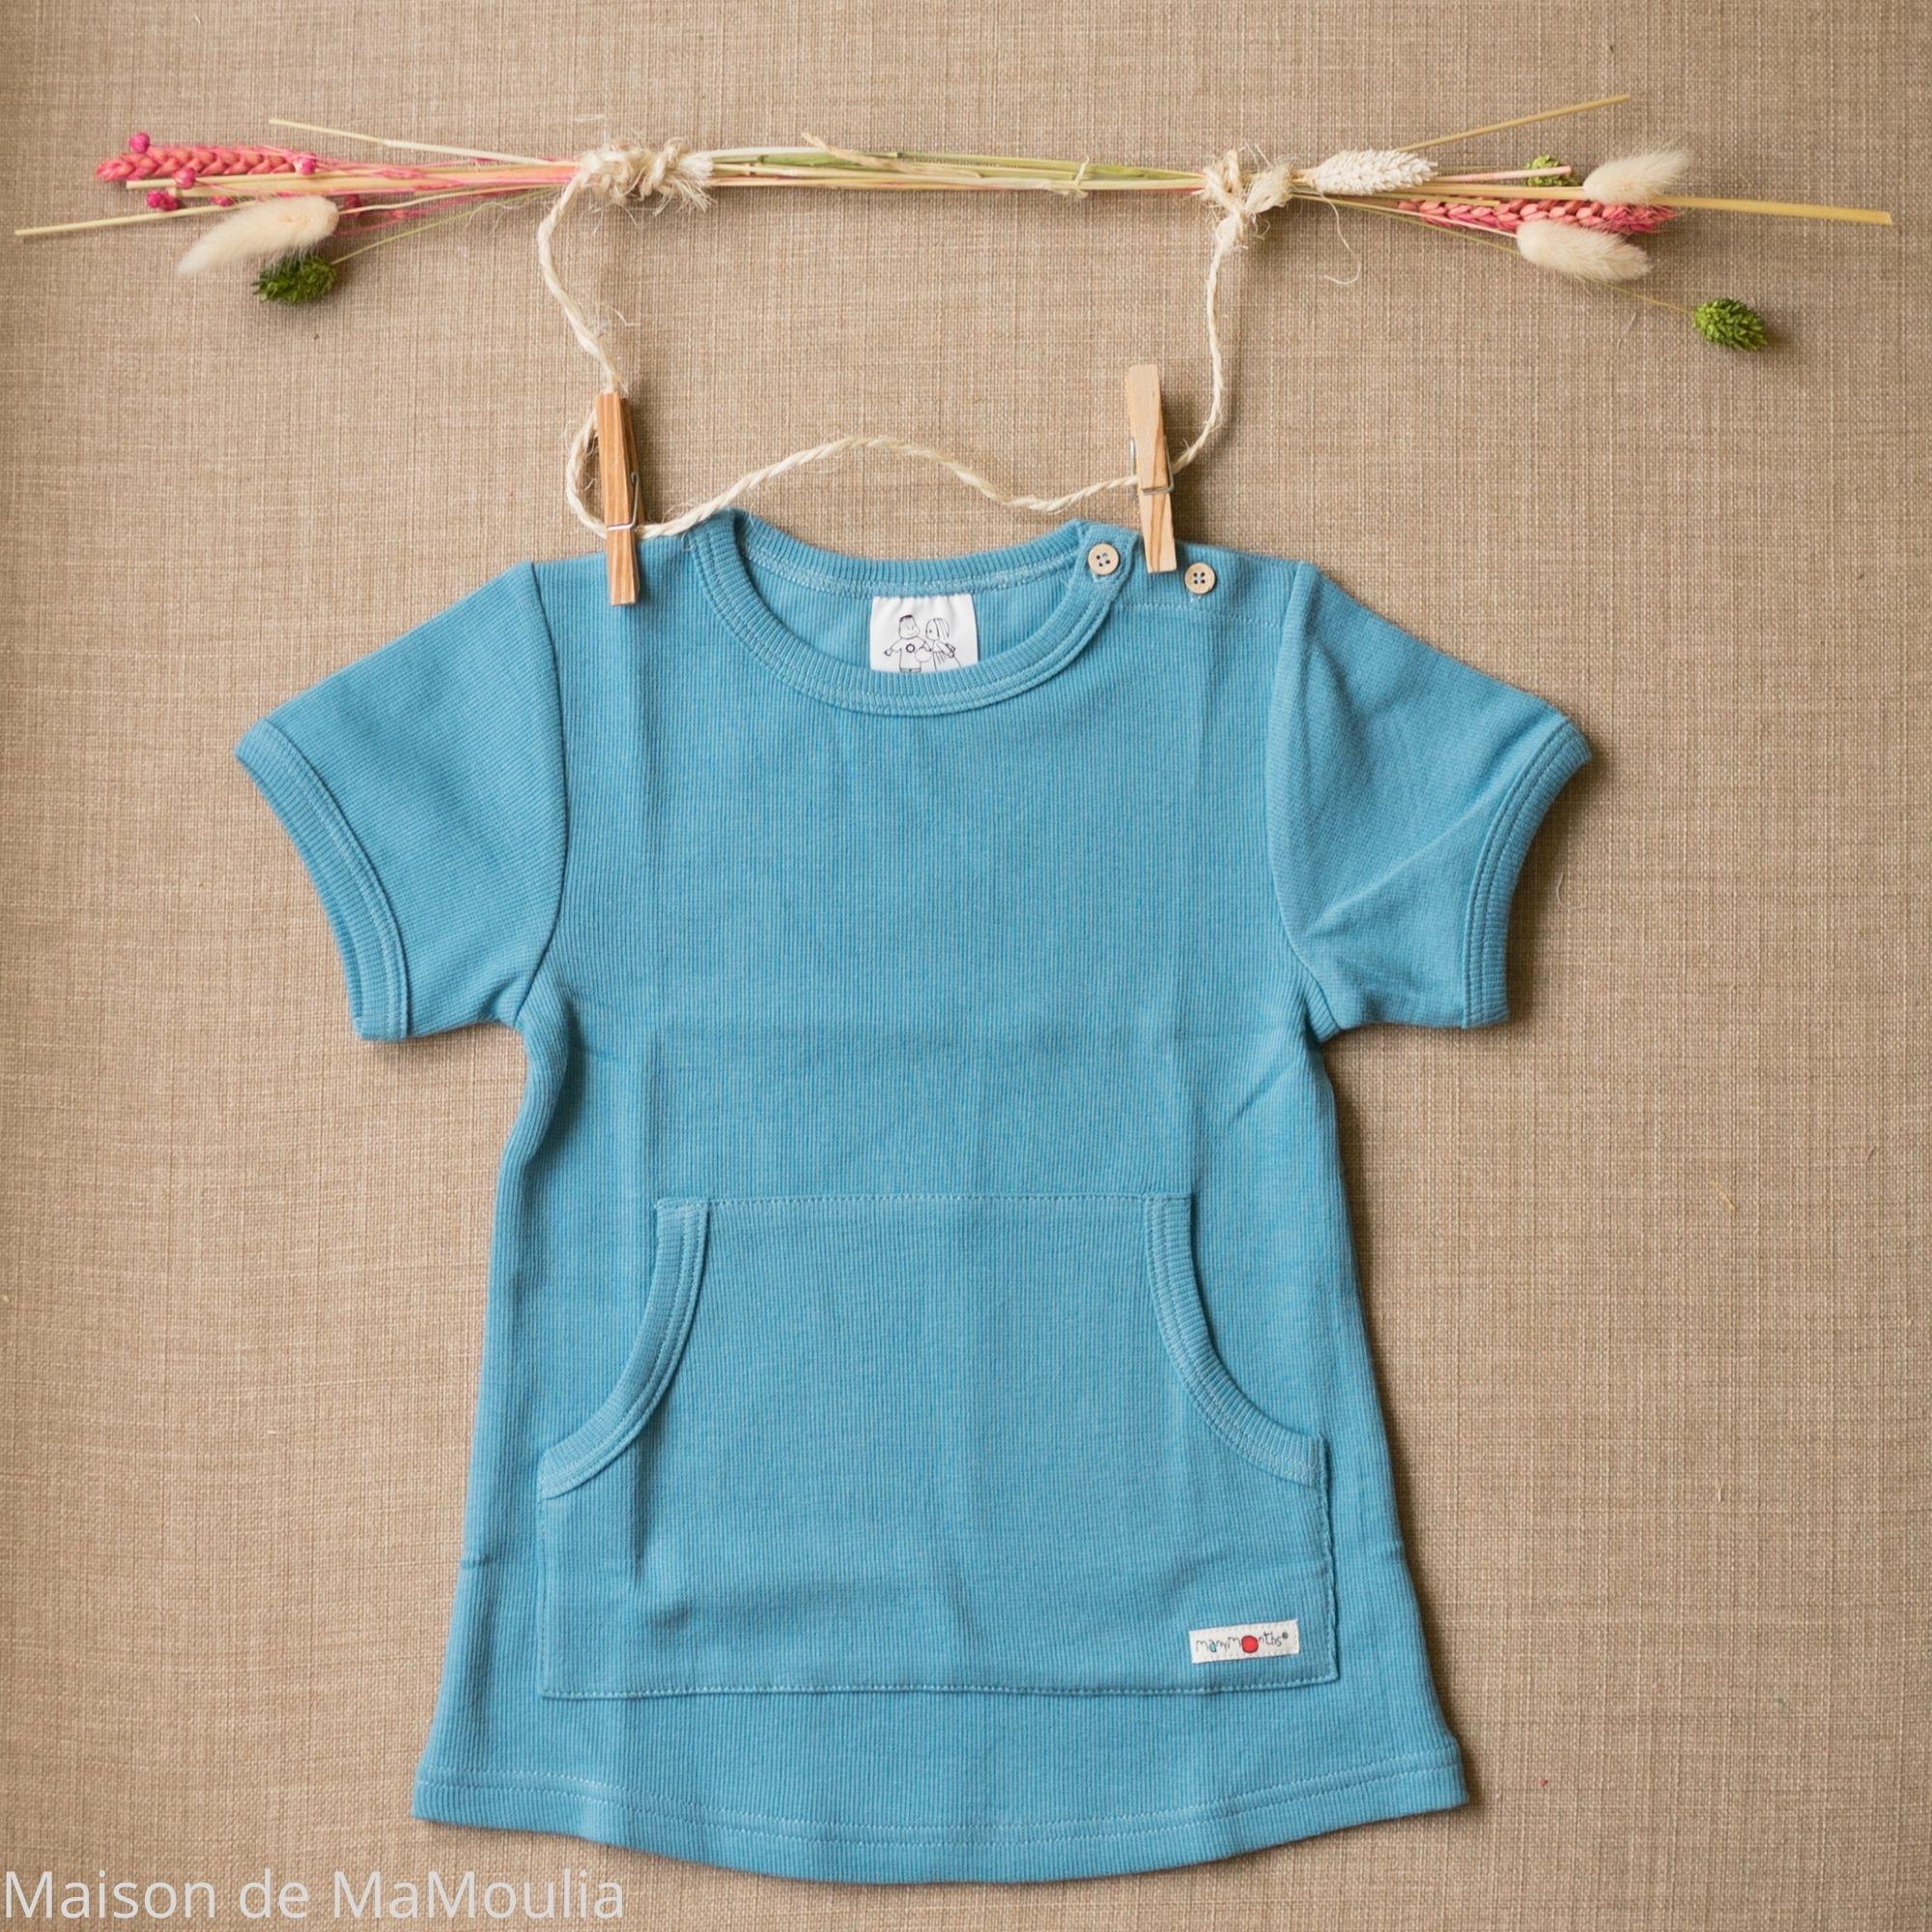 MANYMONTHS Eco - T-shirt Évolutif - Manches courtes - Milky blue